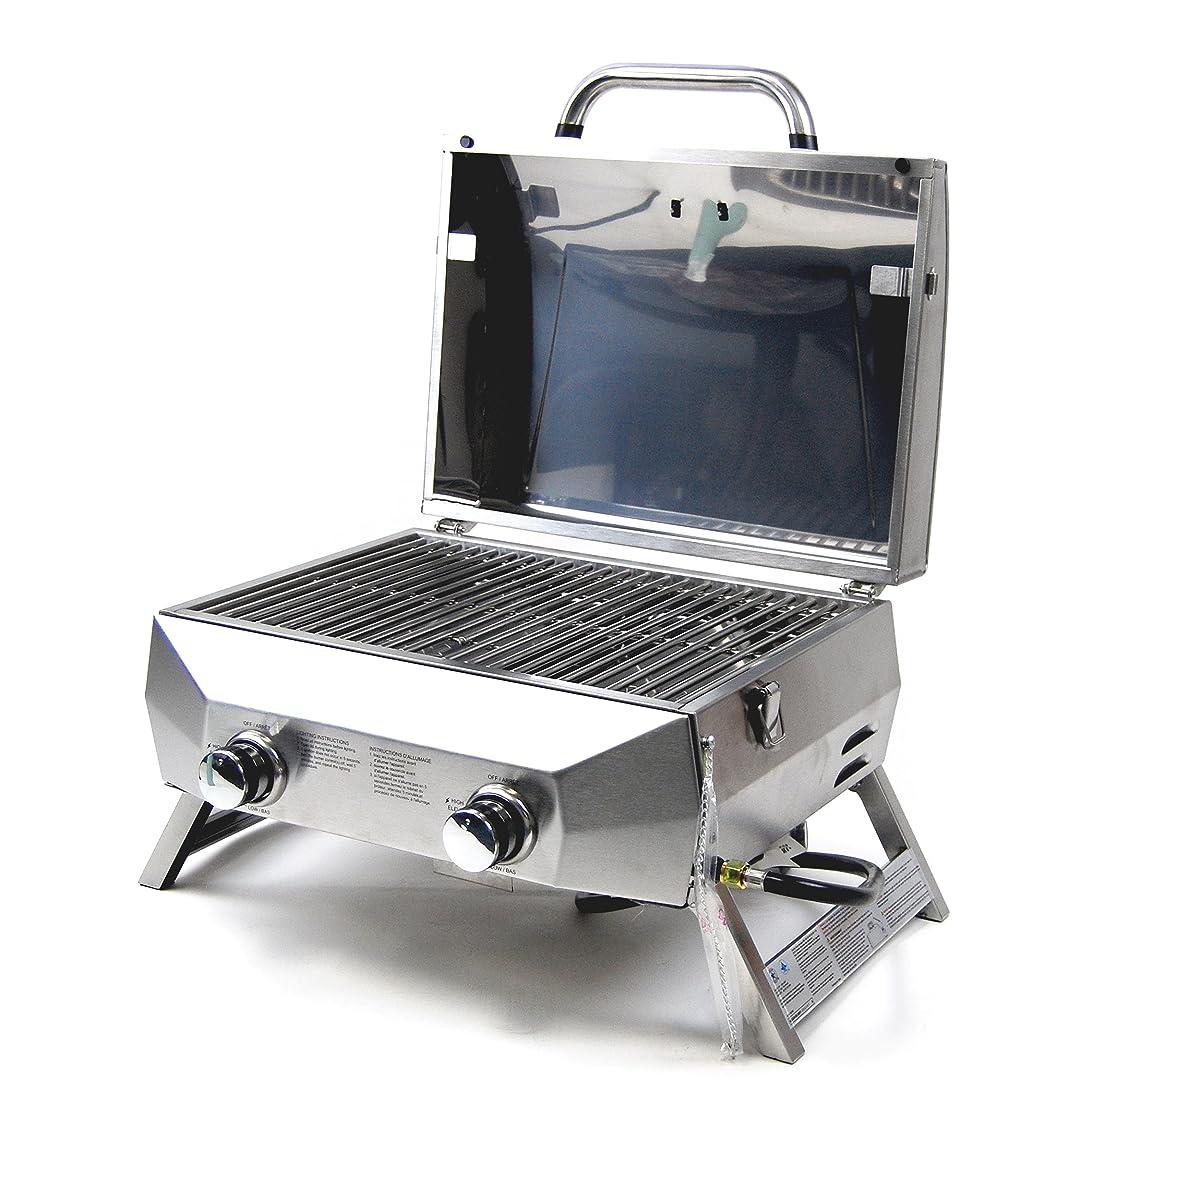 SUPERSPACE 2 Burner Stainless Steel BBQ Tabletop Propane Gas Grills, 20,000 BTU